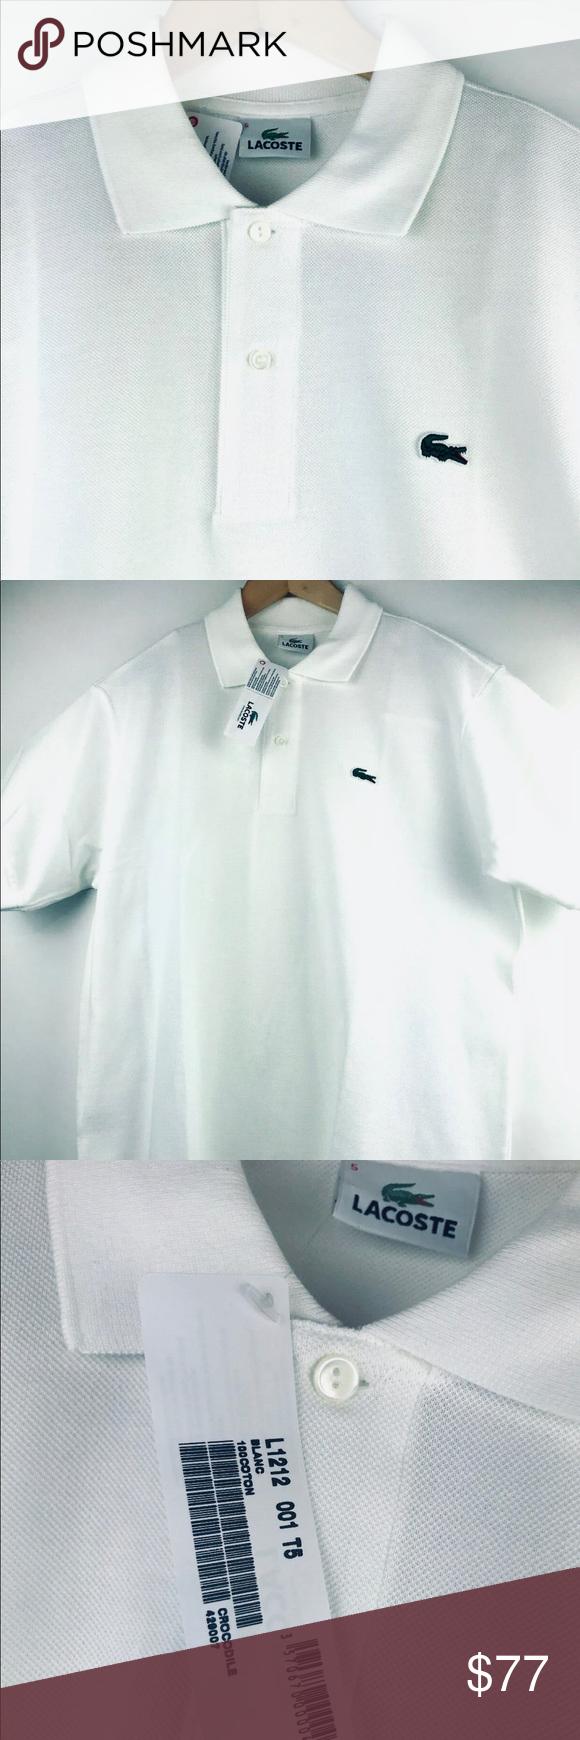 Lacoste Polo Shirt Crocodile Pique White Cotton 5 Lacoste Polo Shirts Lacoste Shirts